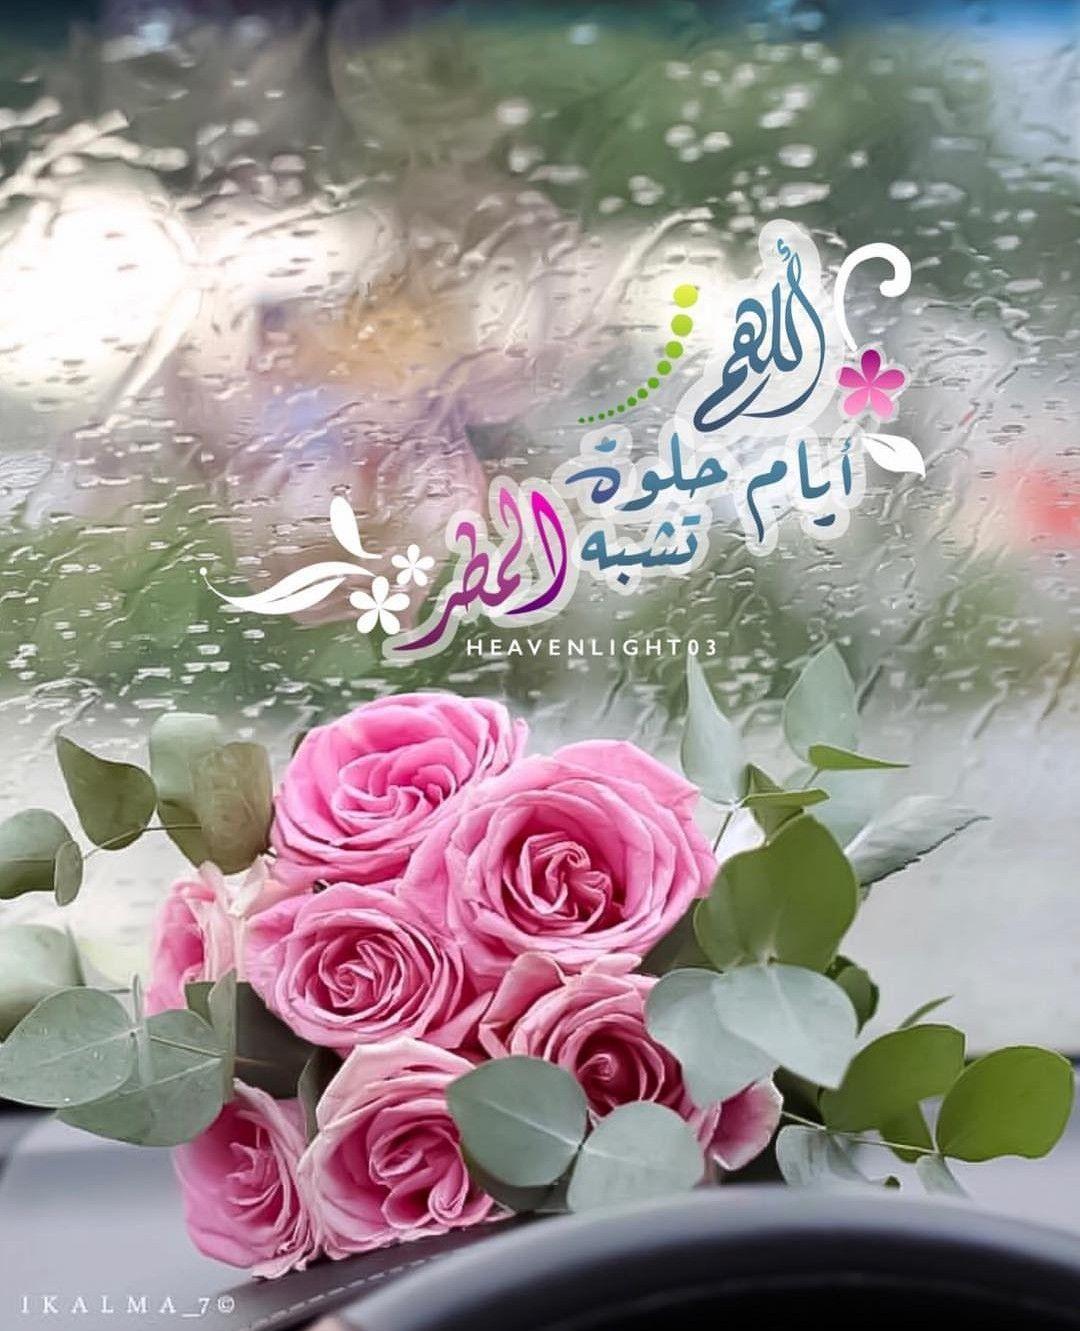 اللهم أيام حلوه تشبه المطر Islamic Quotes Islamic Quotes Quran Cool Words